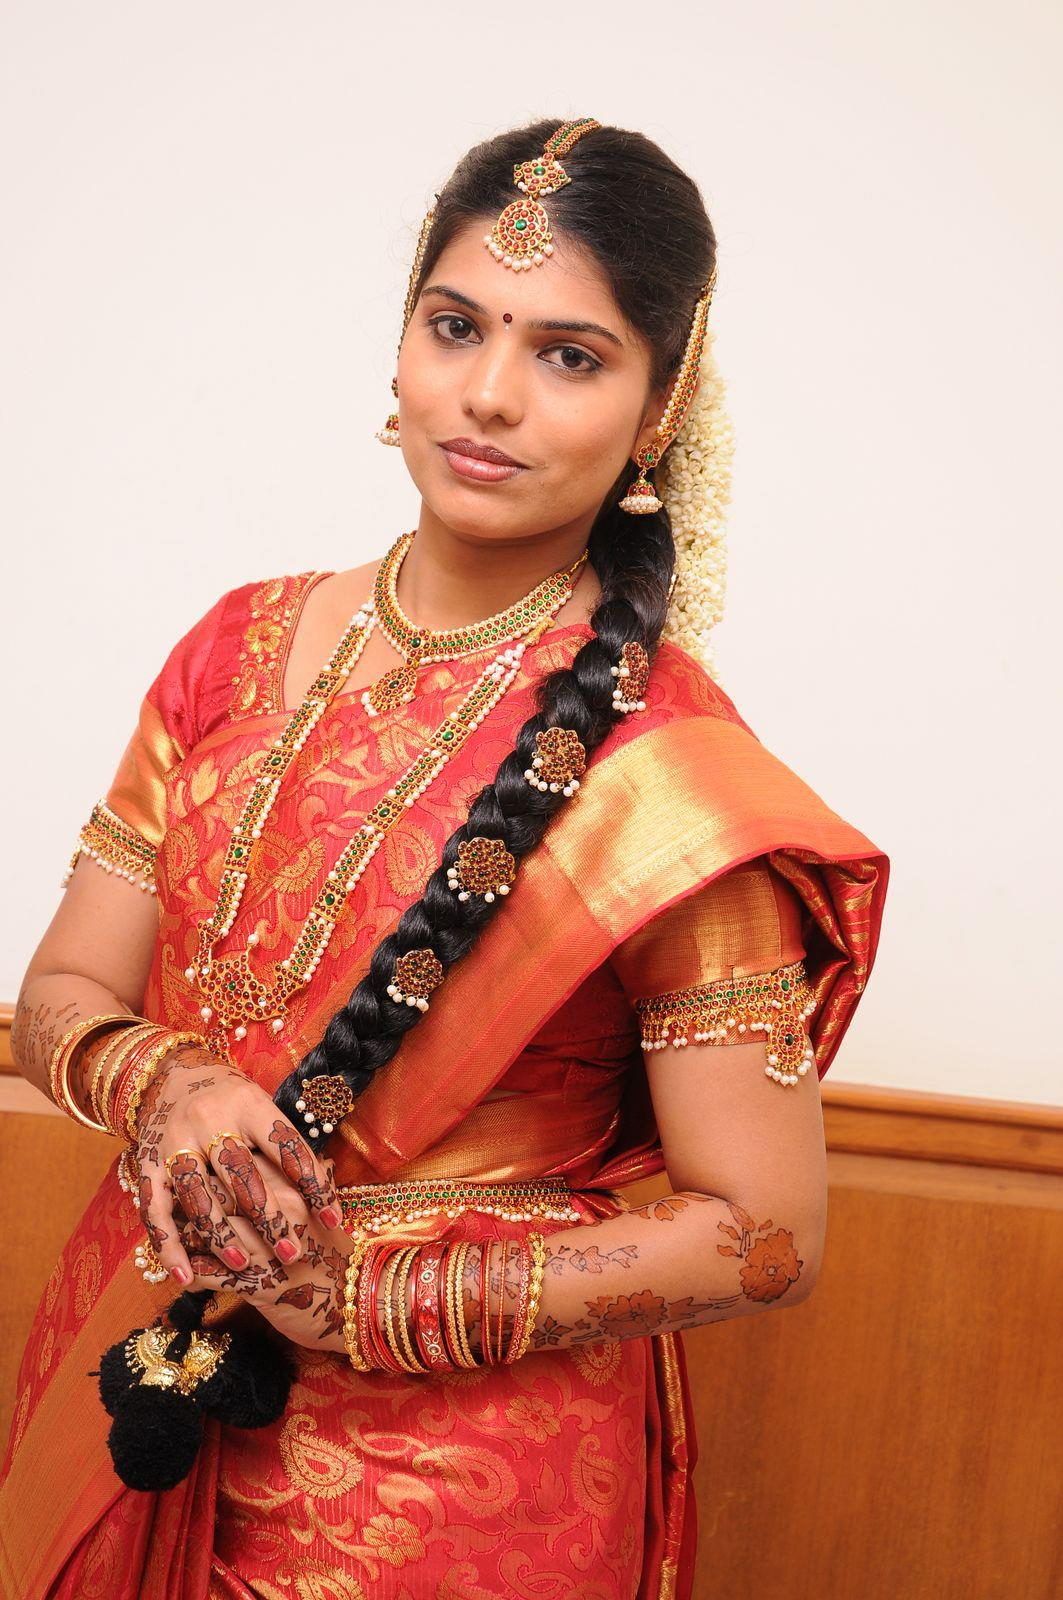 Tamilnadu Bridal Hairstyle : Traditional bridal hair style by tamil nadu culture long